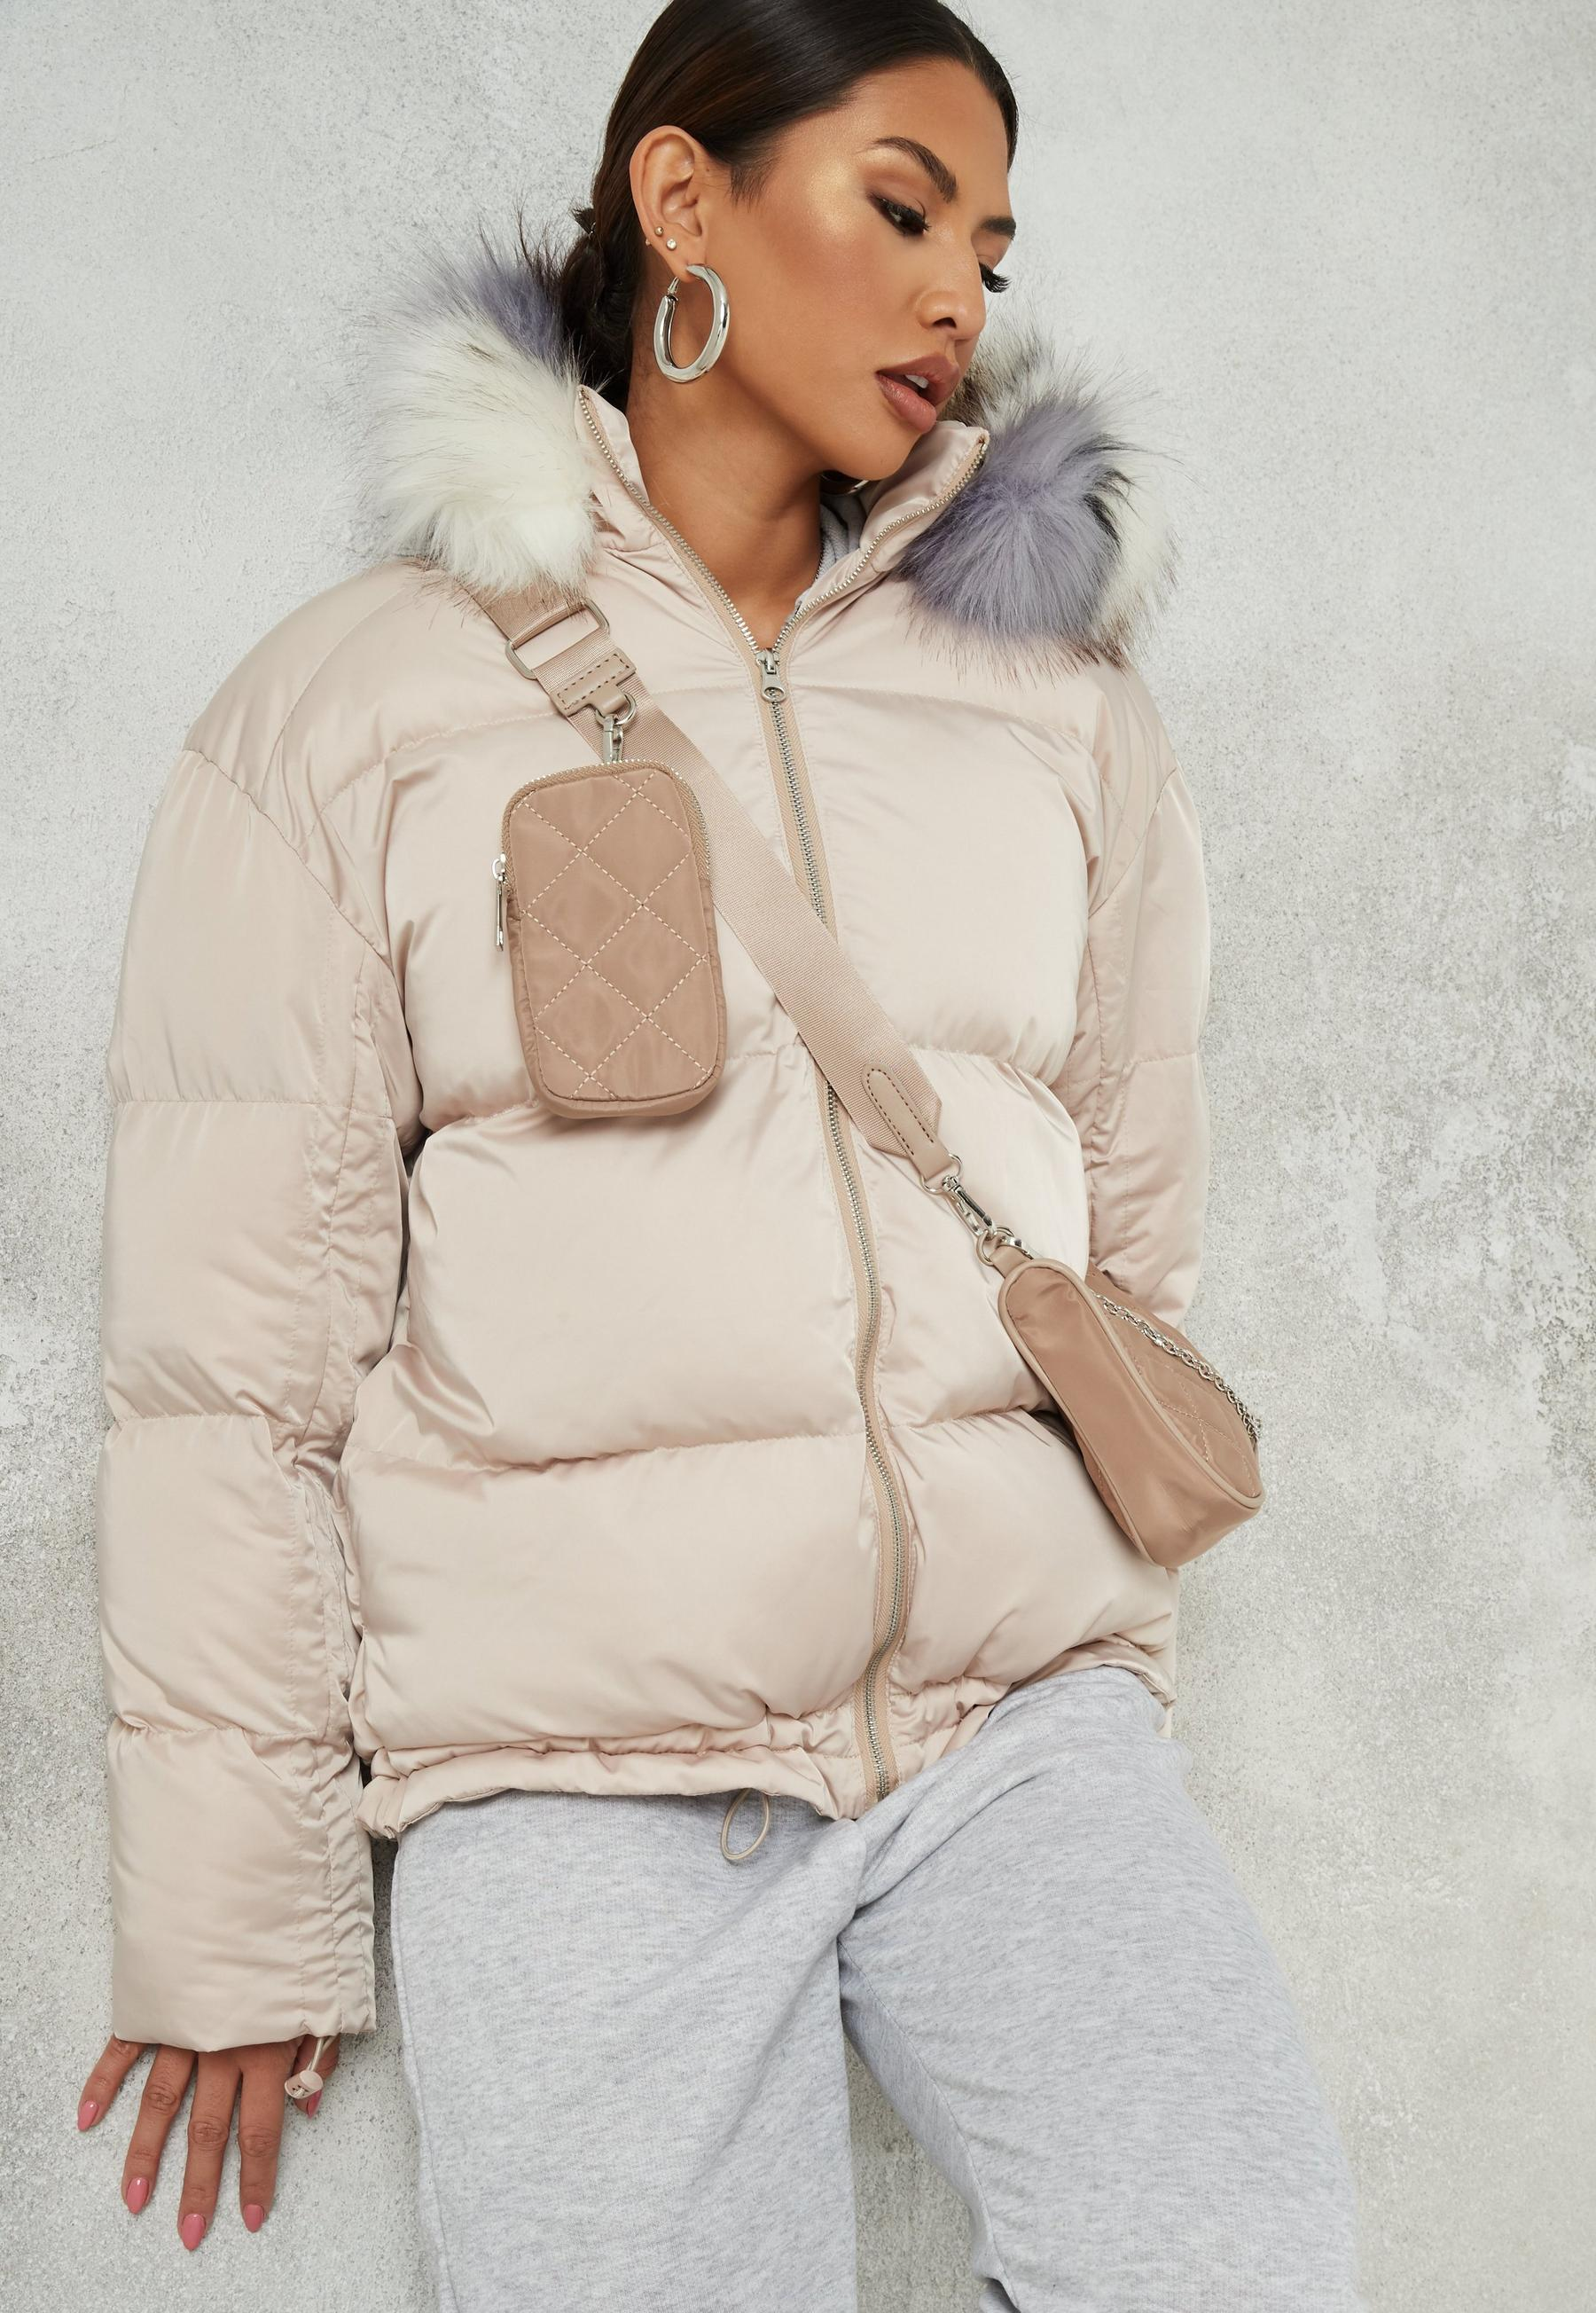 Nude Faux Fur Gilet | Coats & Jackets | PrettyLittleThing